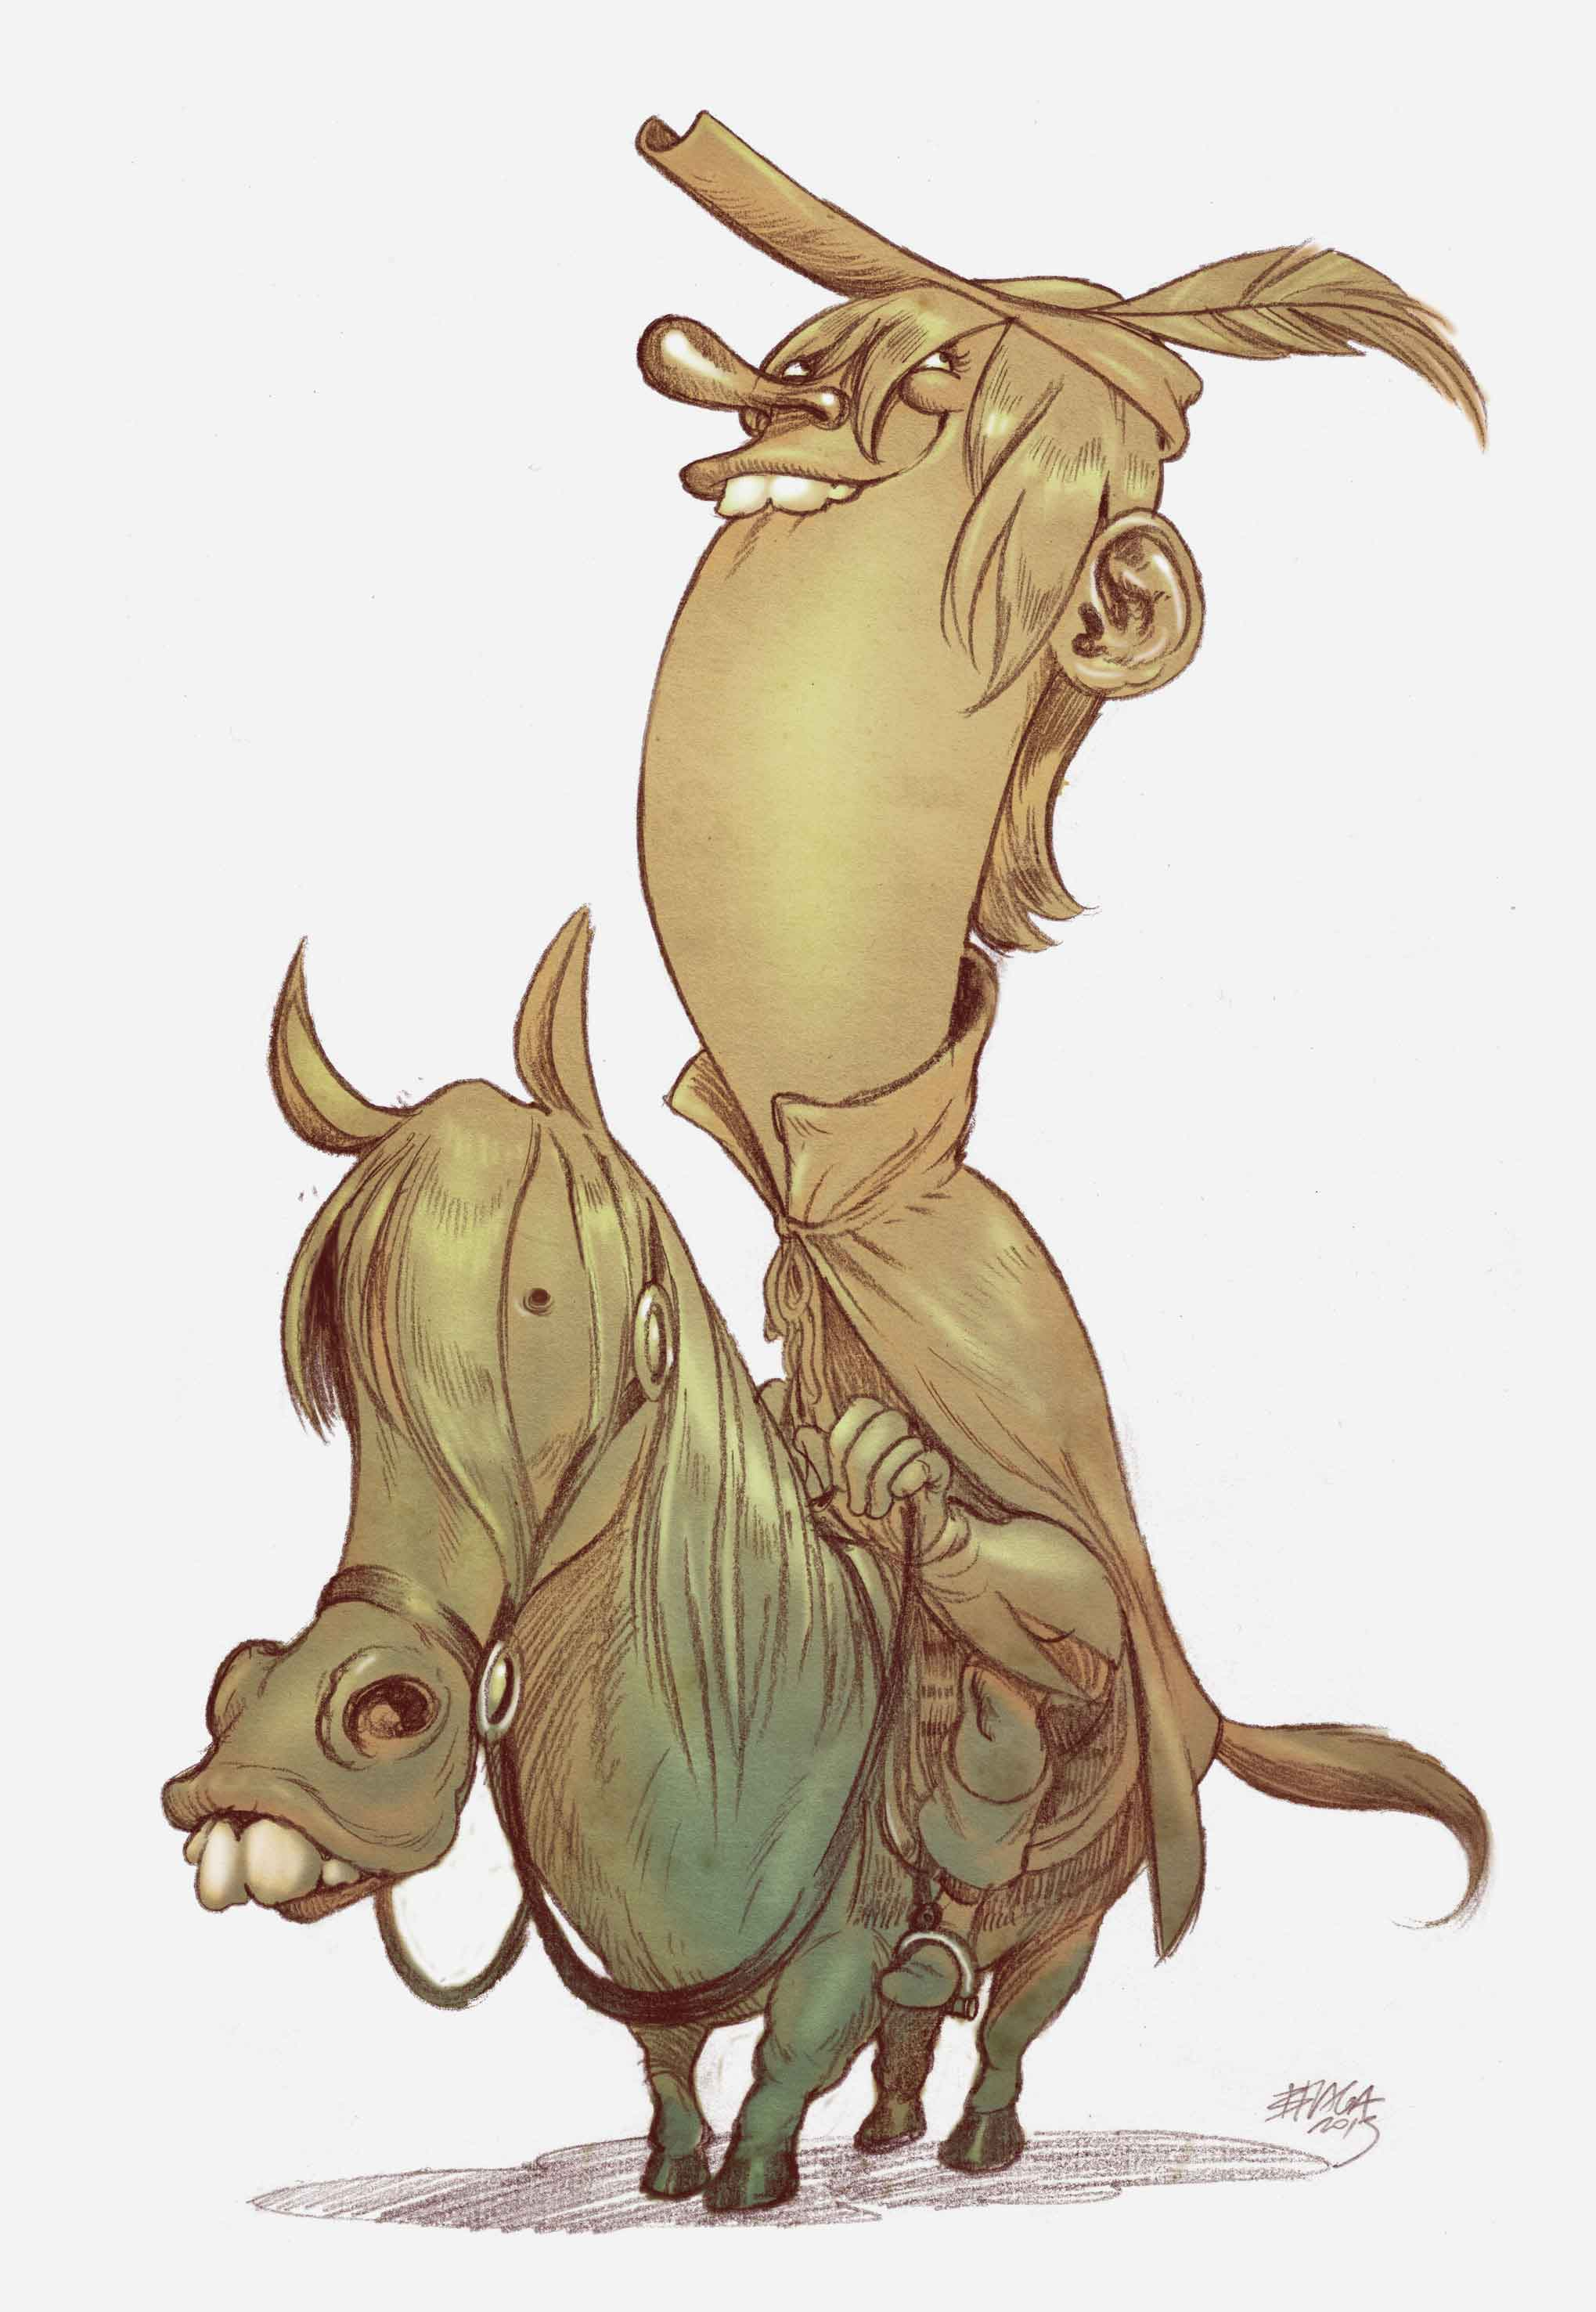 principe-encantado-diburros-braga